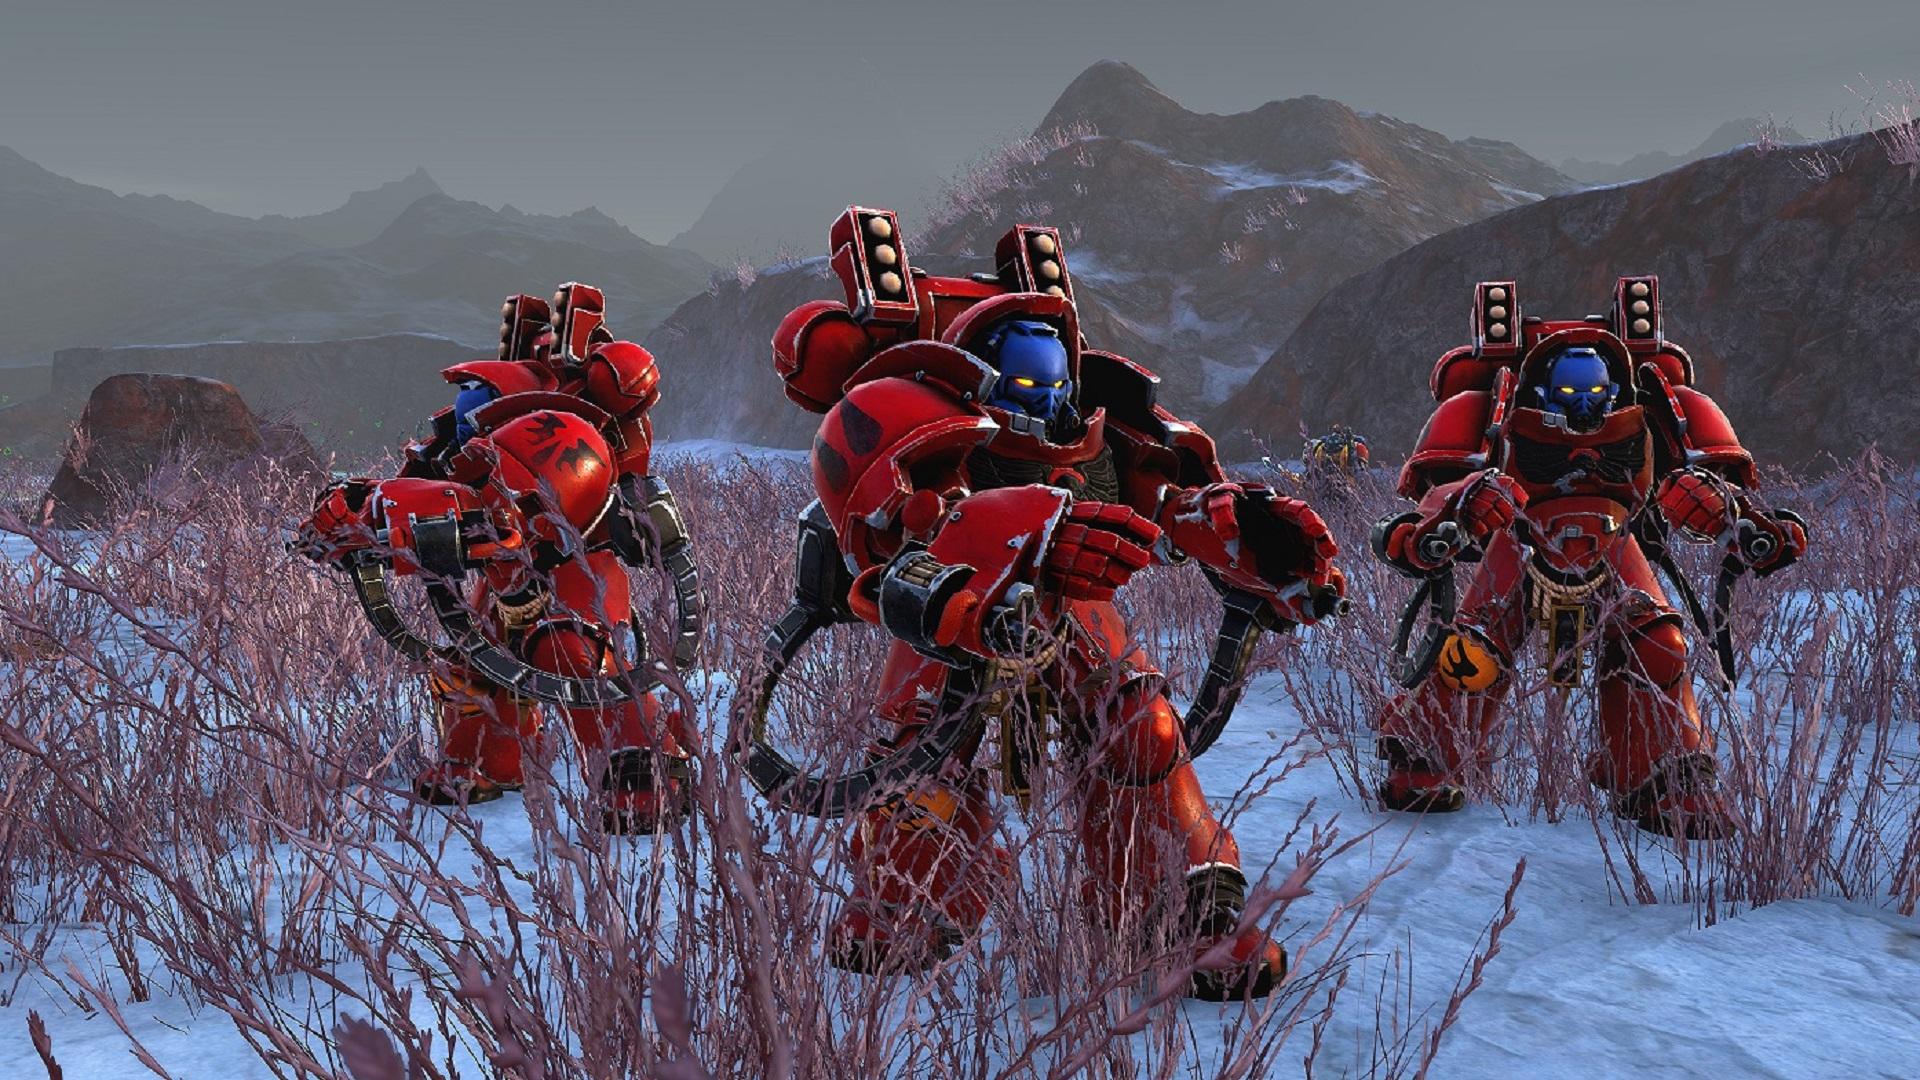 warhammer-40,000-battlesector-set-for-15-july.jpg